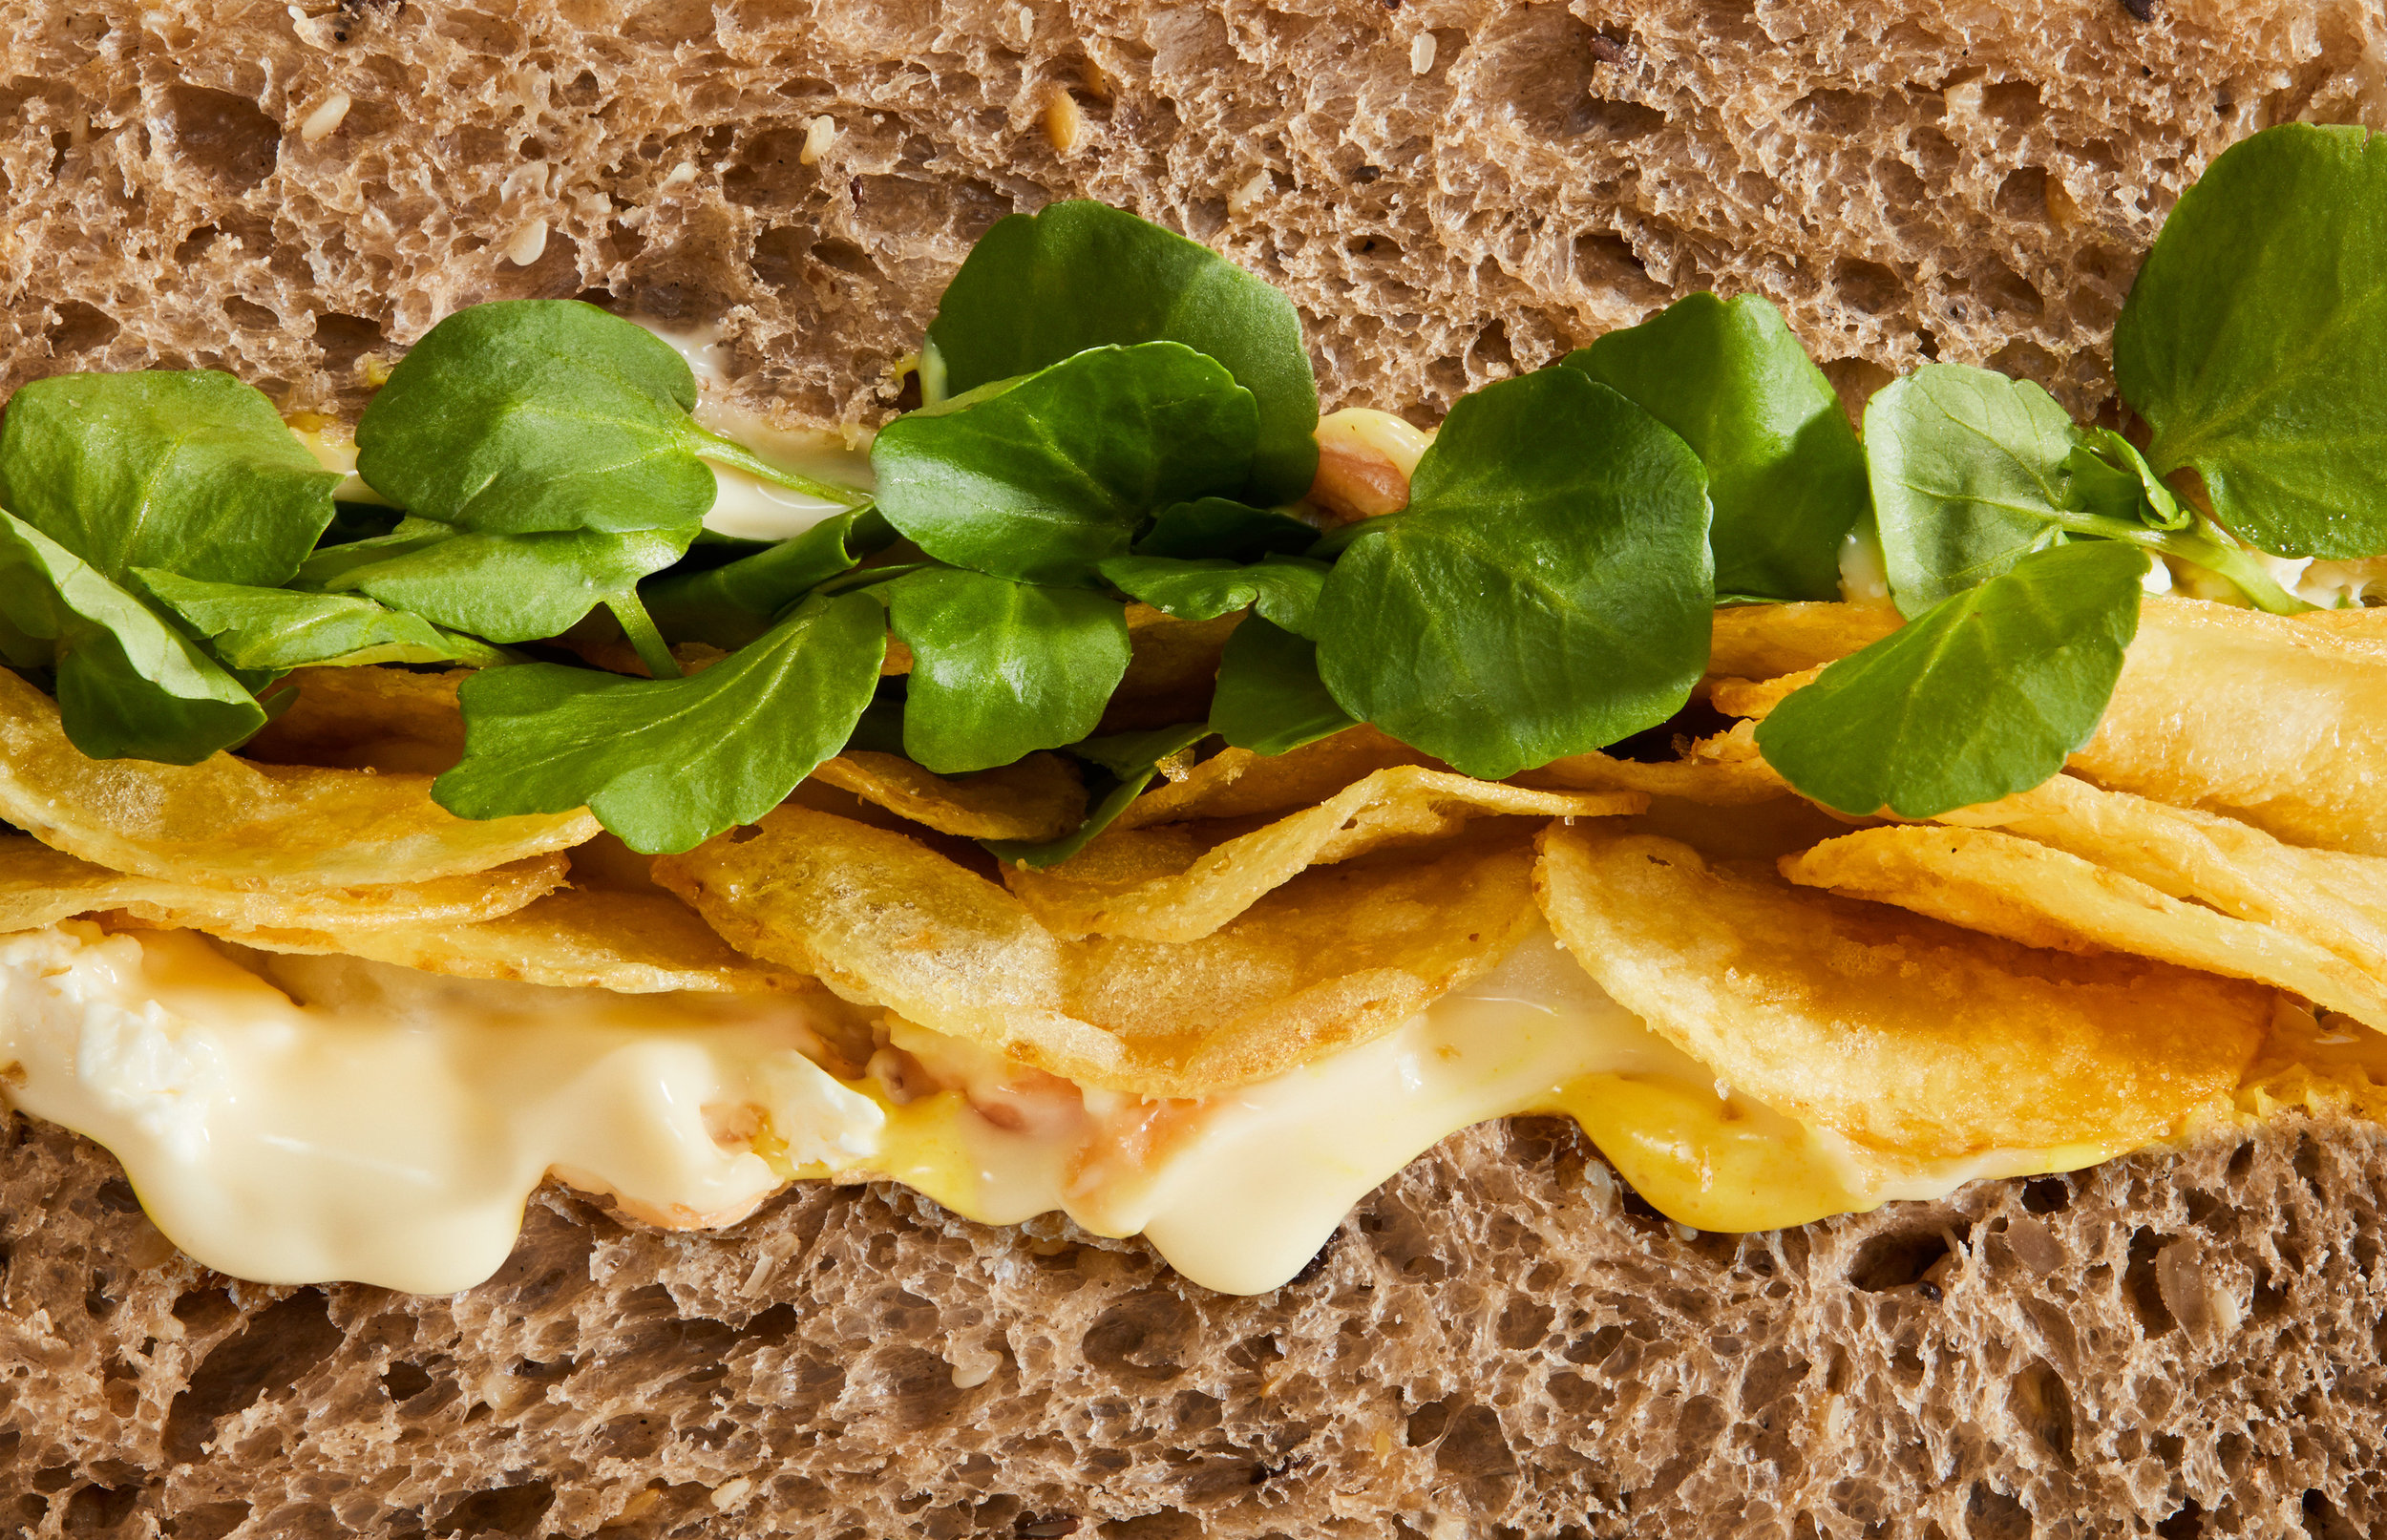 20161205+Sandwich+5-6391+01a.jpg